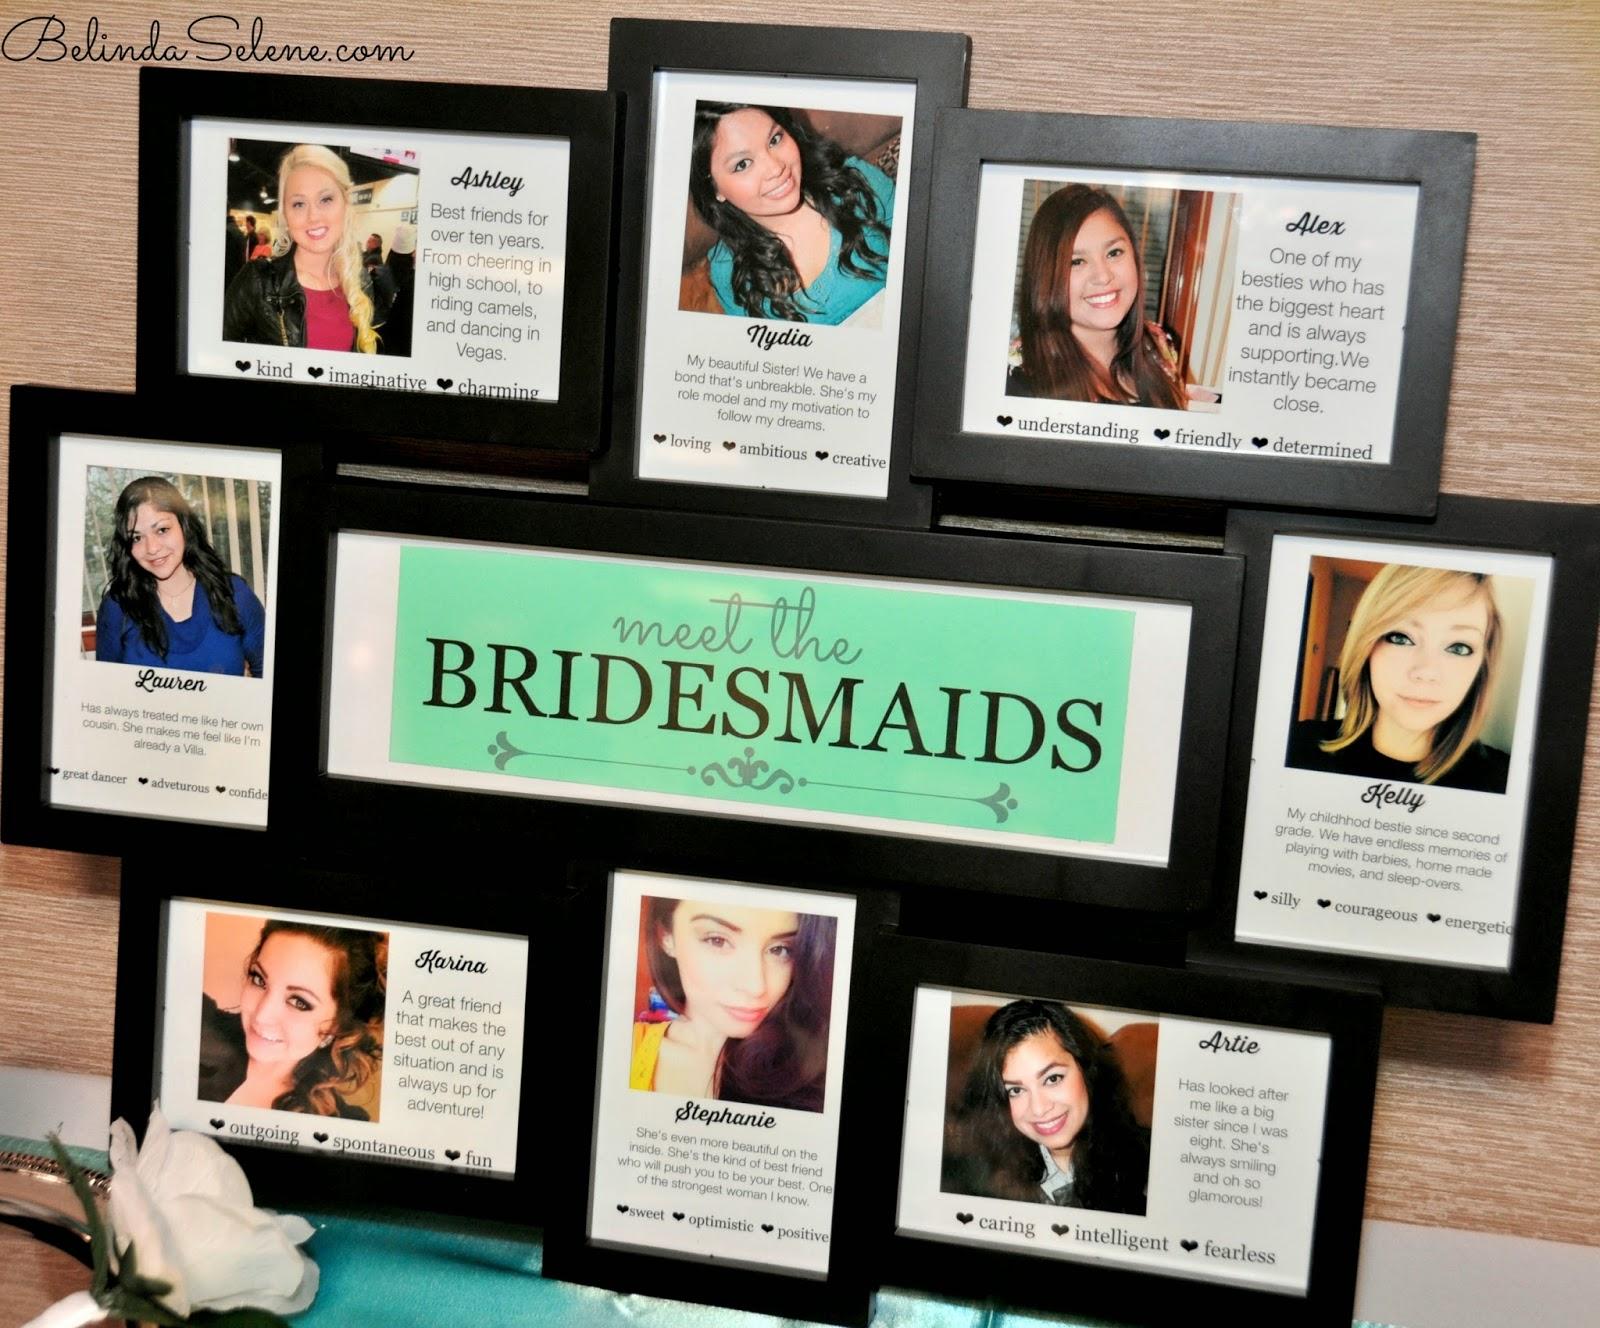 bridesmaid meet and greet ideas